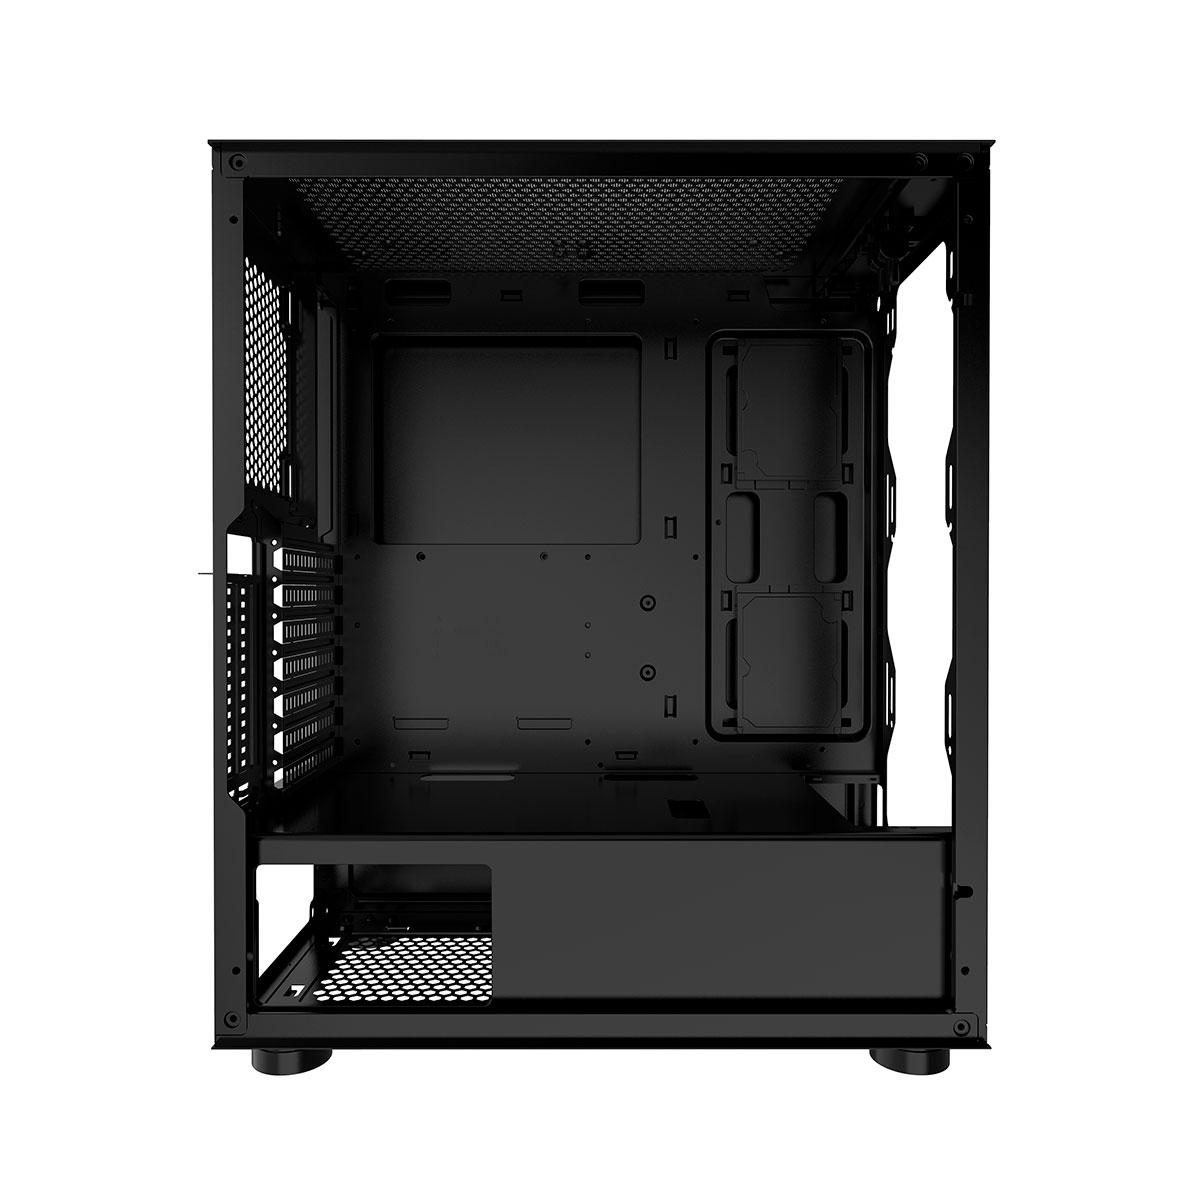 Gabinete Gamer Bluecase BG-035 Pulse Advanced, Preto, LED RGB, Lateral em Vidro Temperado, USB 3.0